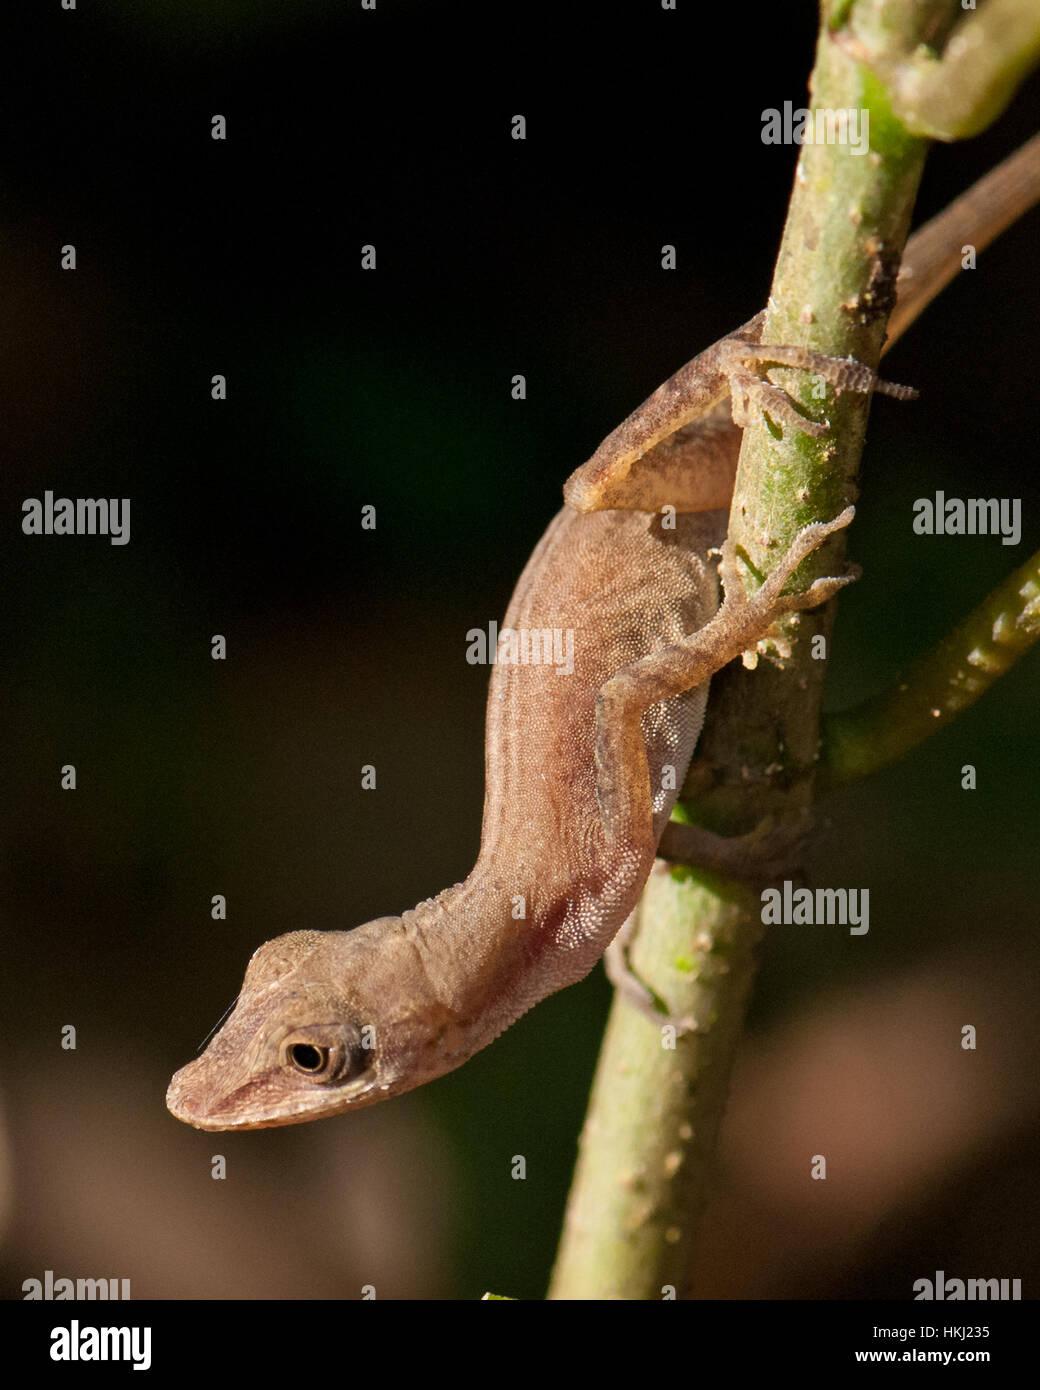 tropical house gecko (hemidactylus mabouia) on a branch stock